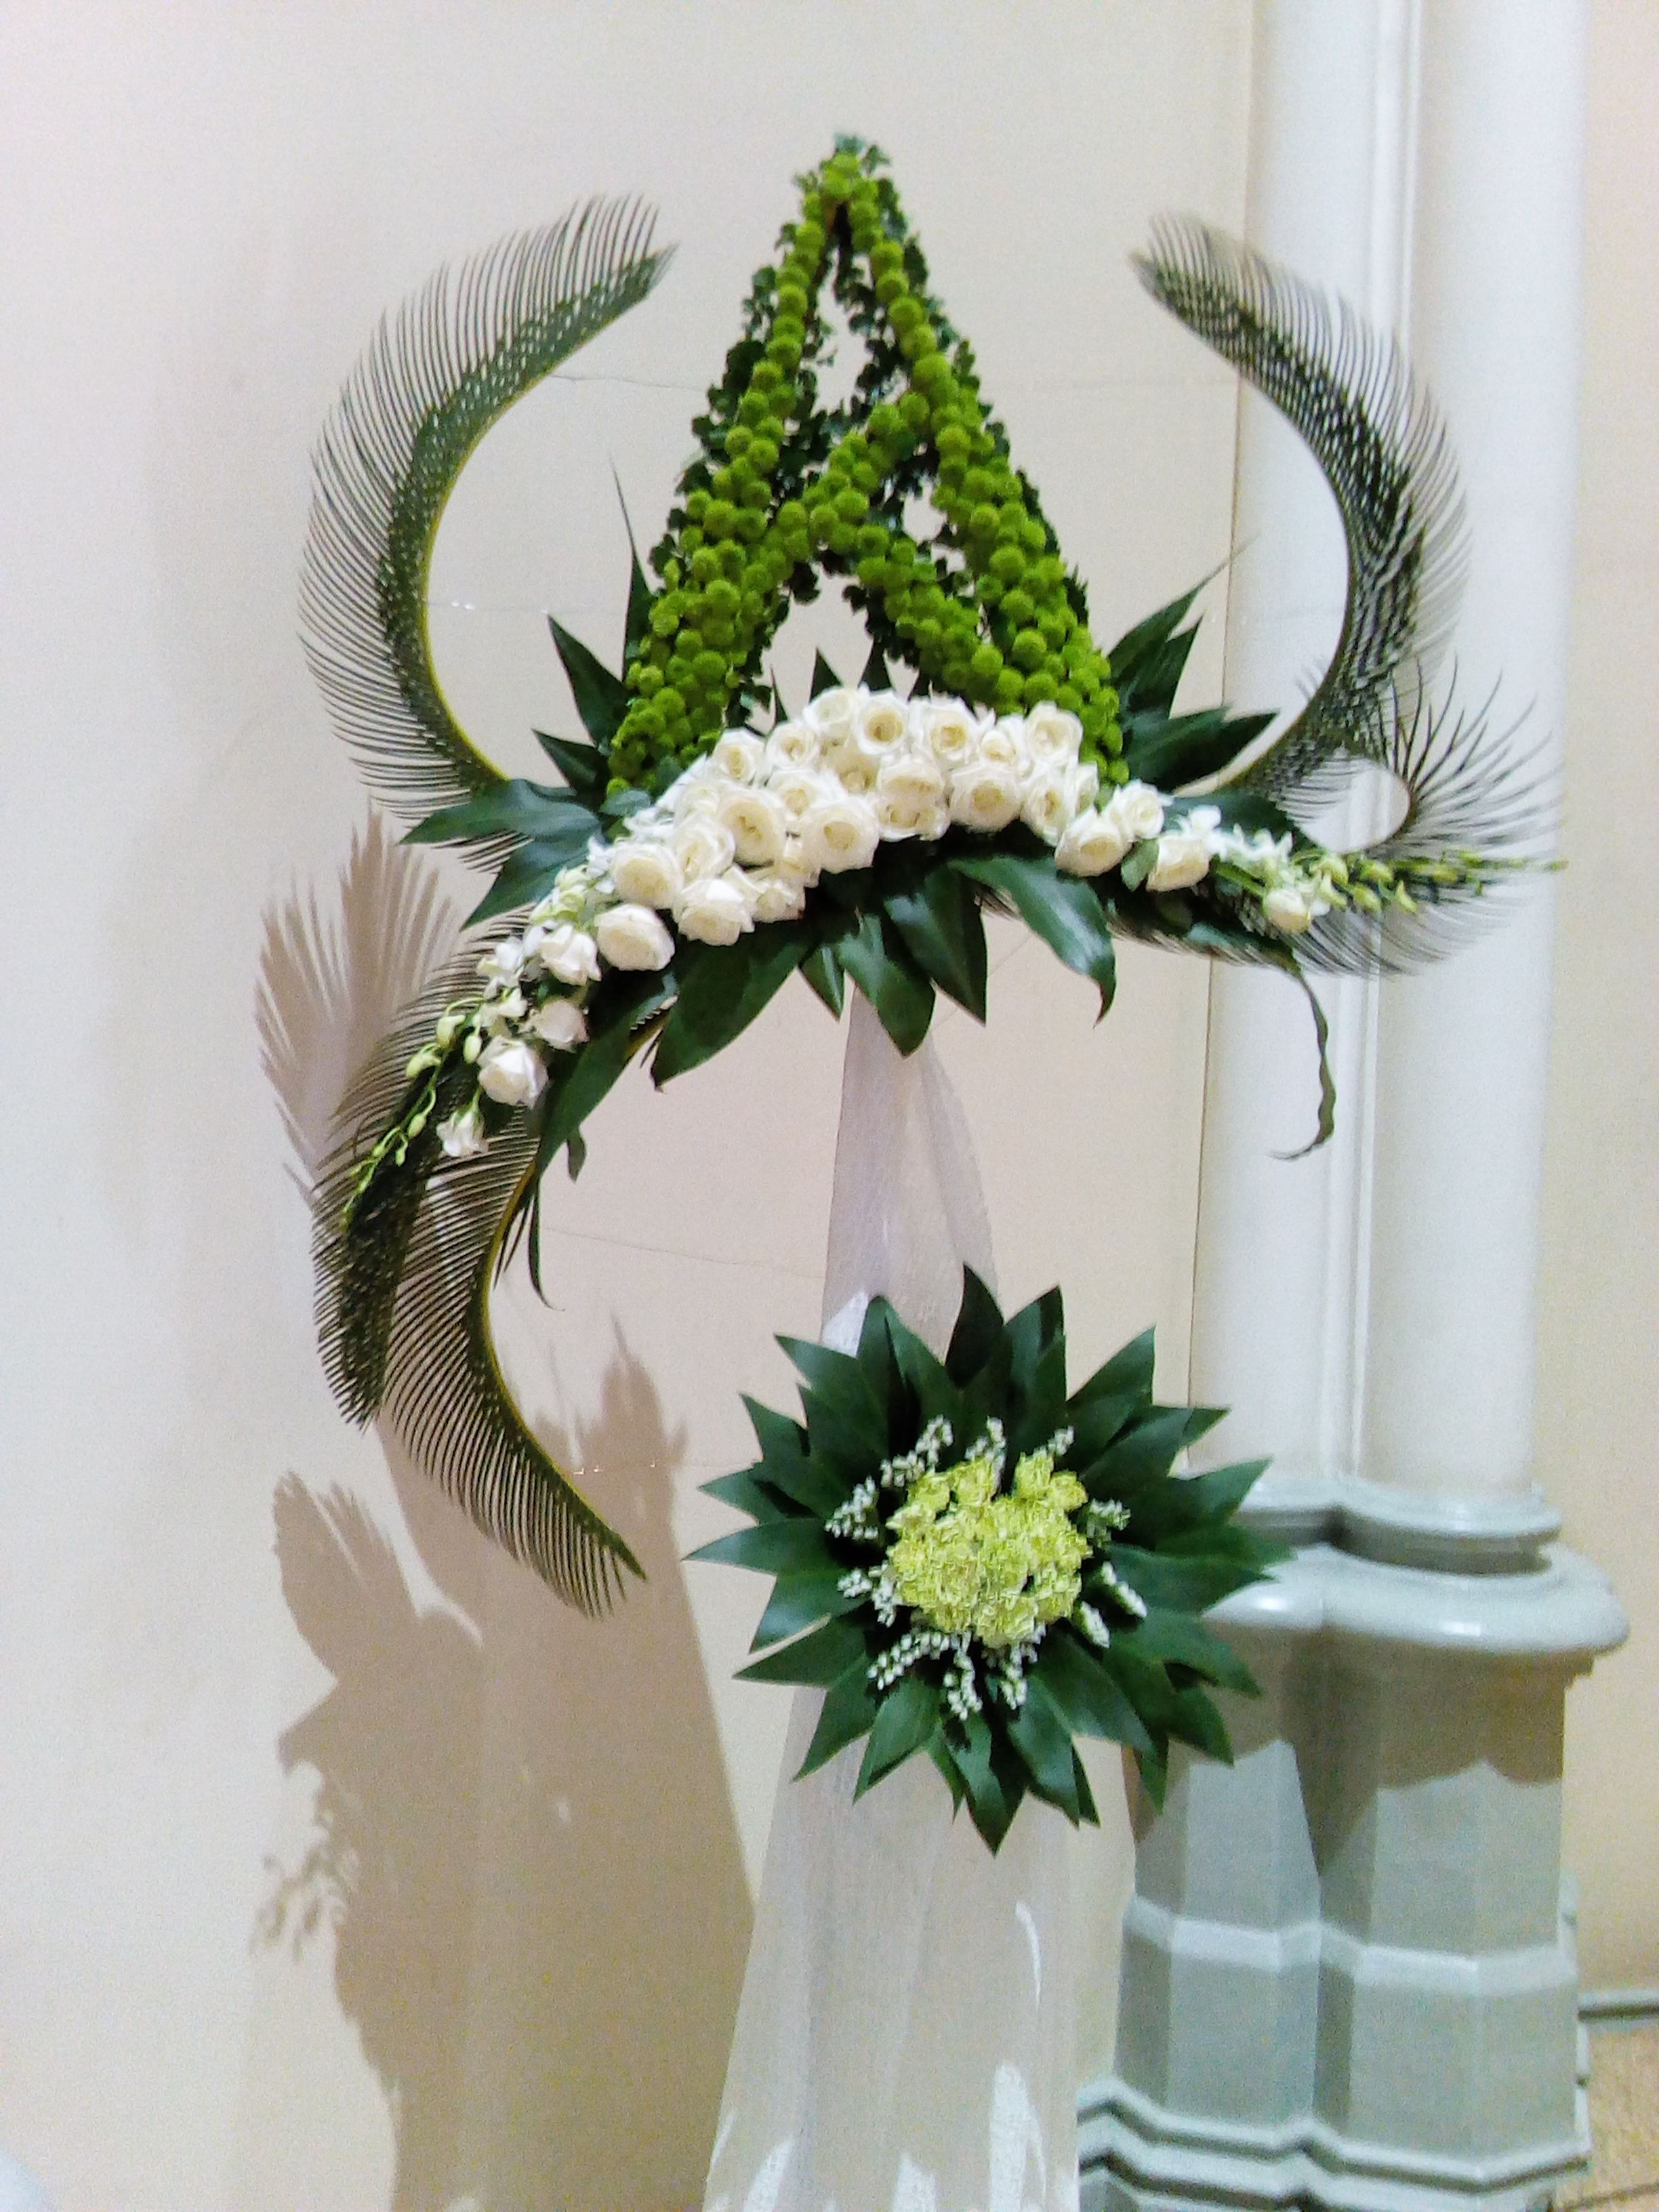 Pin By Thrse Nhi On Cm Hoa Pinterest Flower Arrangements